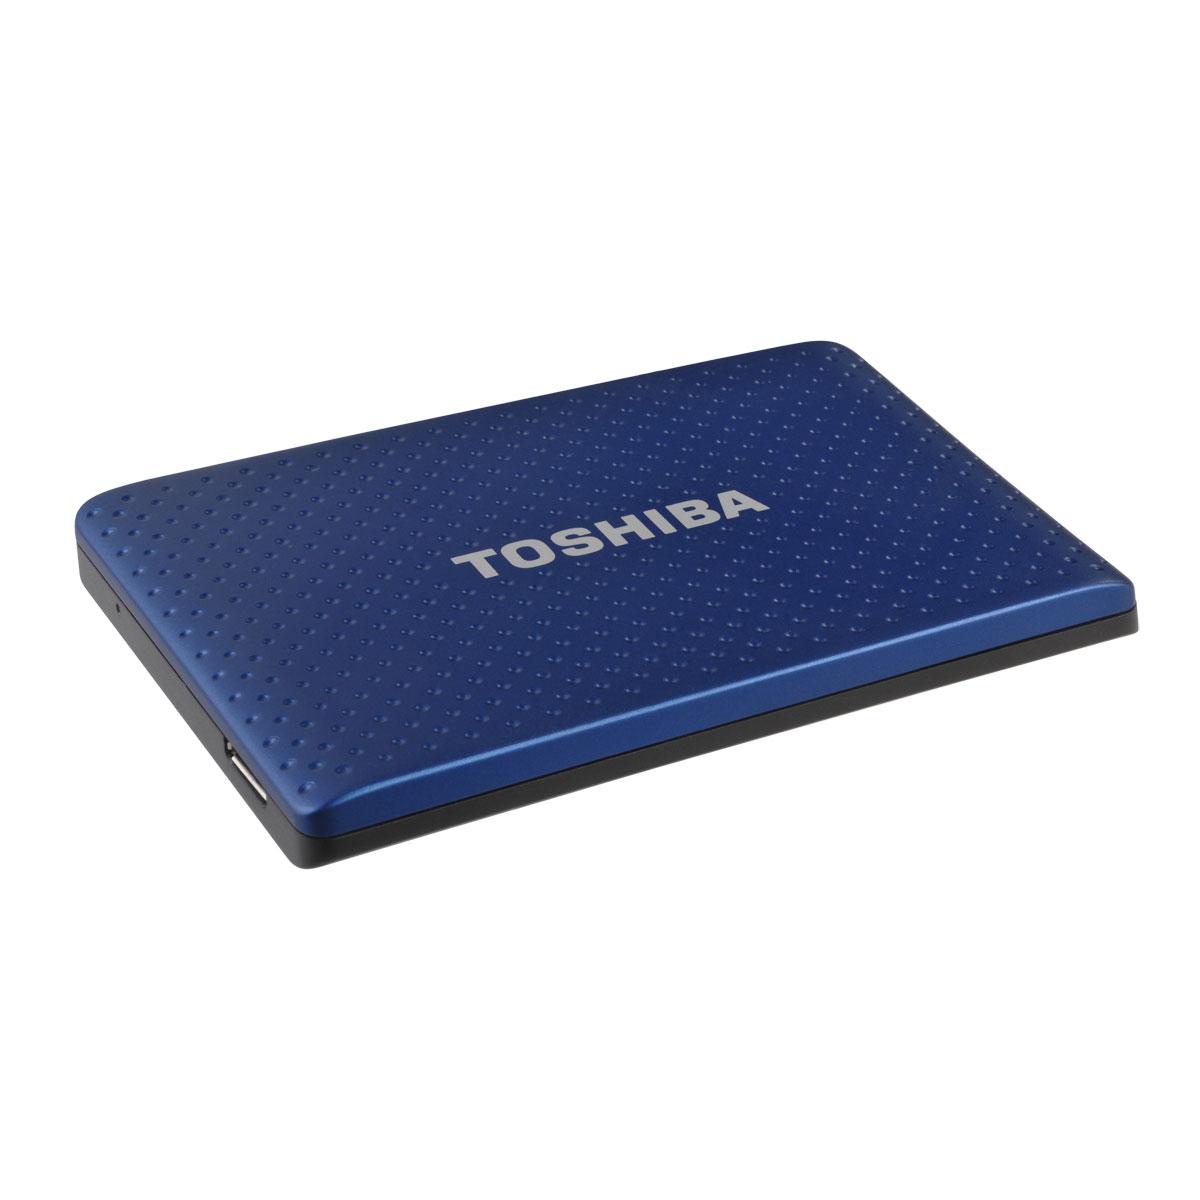 toshiba store partner 500 go bleu disque dur externe. Black Bedroom Furniture Sets. Home Design Ideas